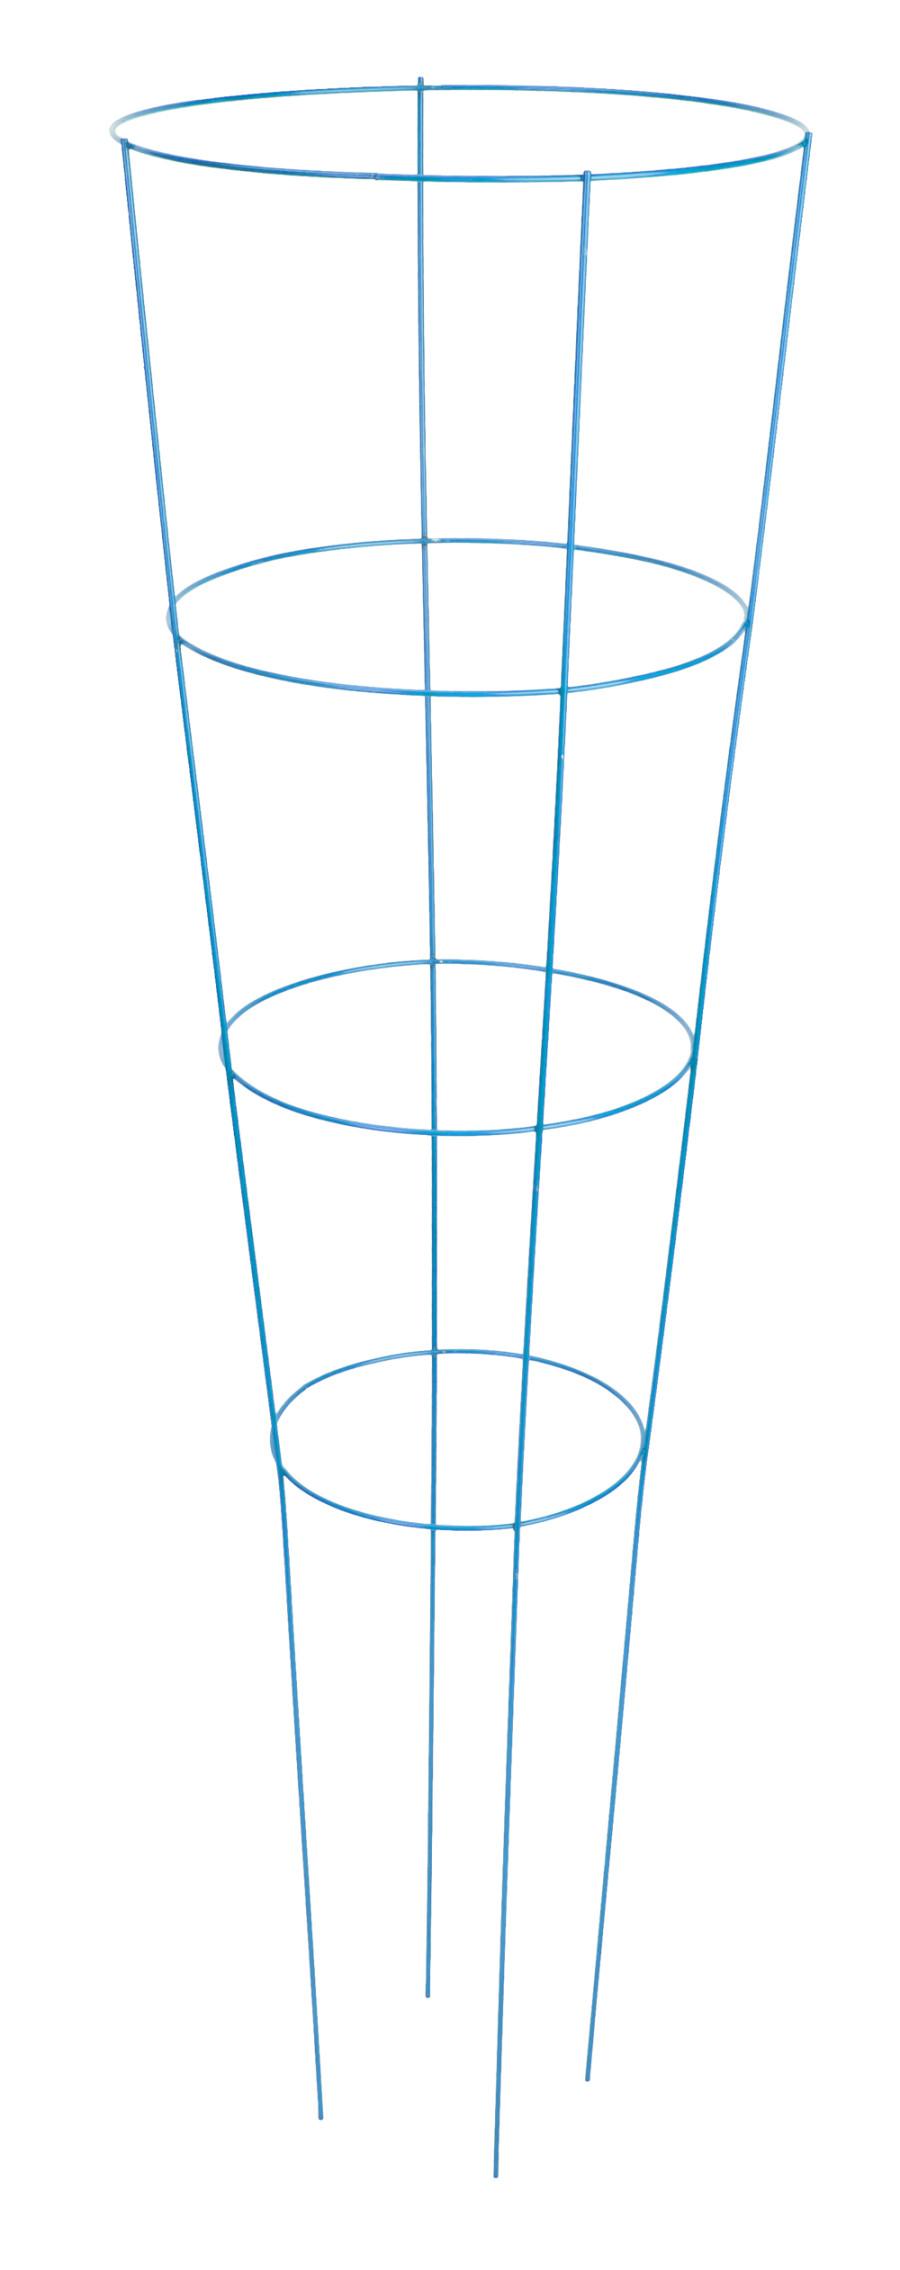 Panacea Tomato Cage 4-Leg 4 Ring